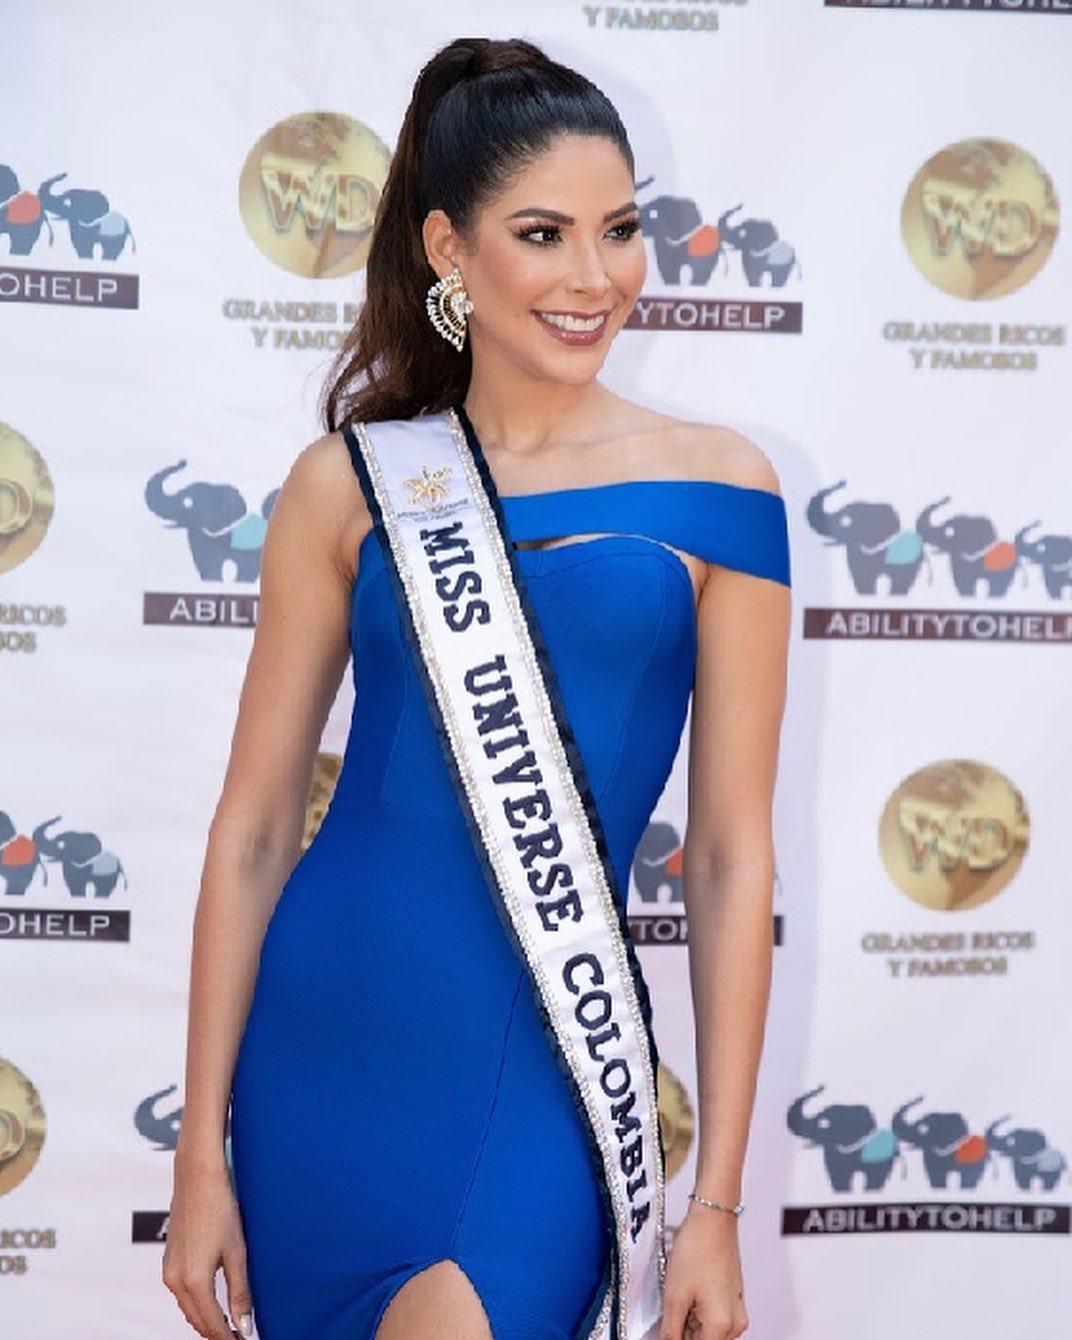 laura olascuaga, miss colombia universo 2020. - Página 20 20534913